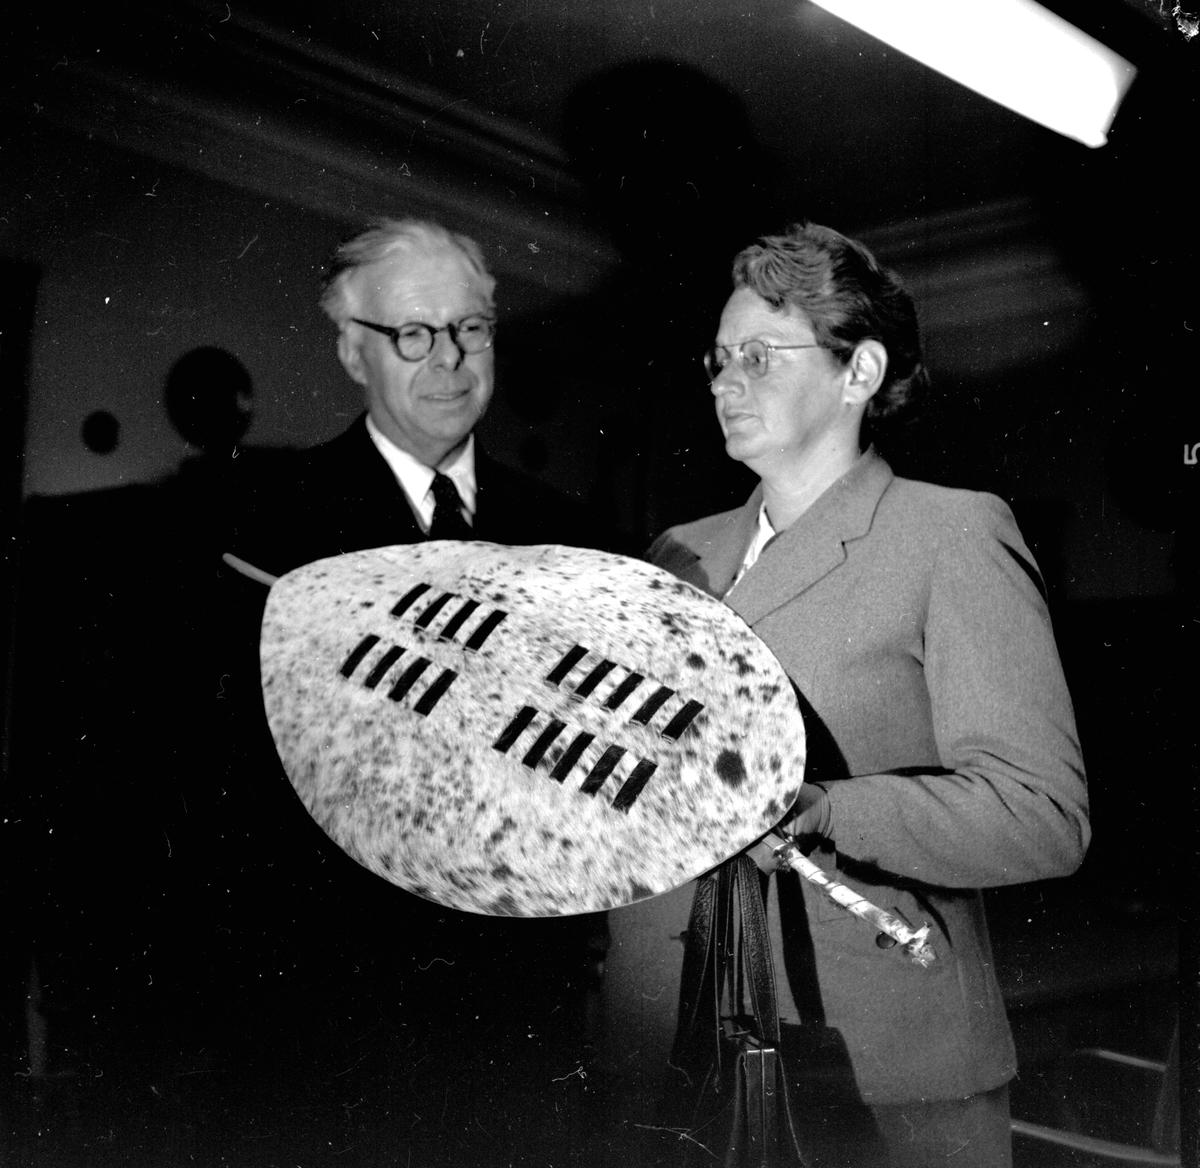 Biskop Erik Sundgren tillsammans med sin fru, Uppsala januari 1957